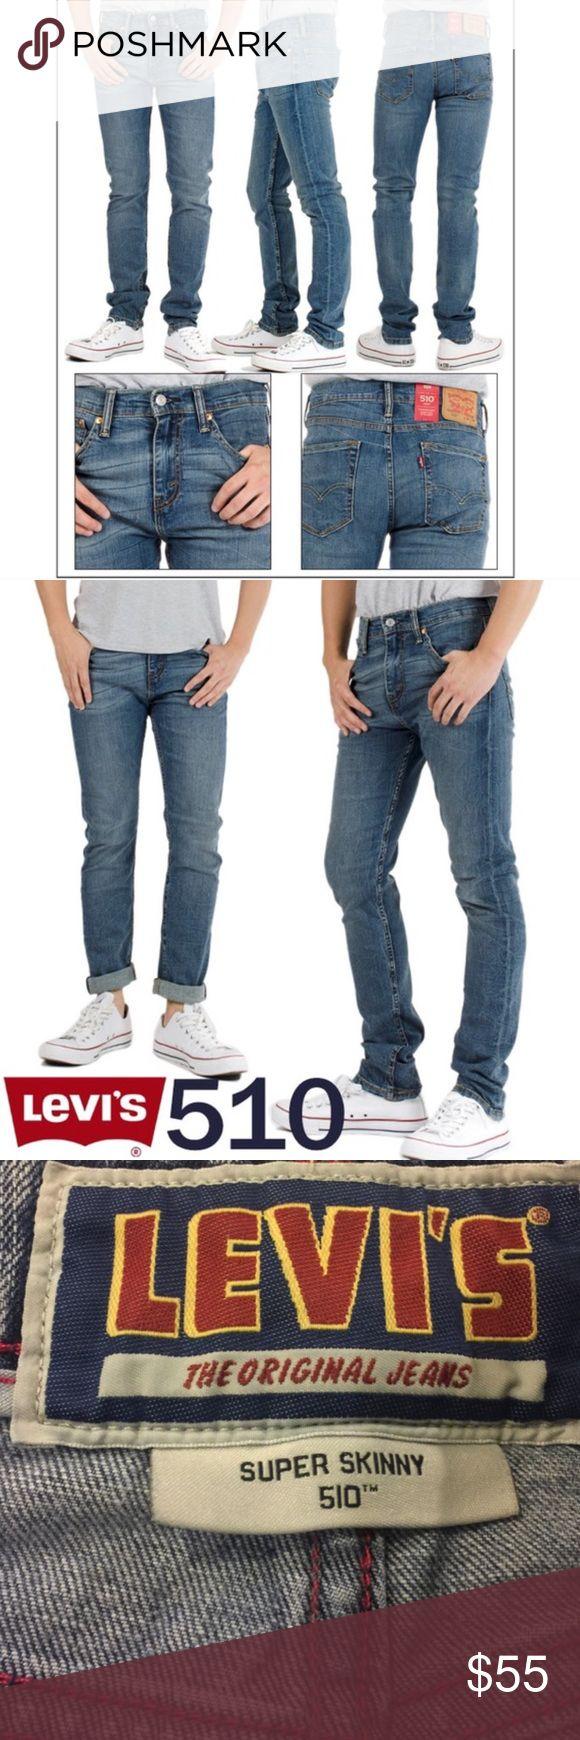 Men's Levi's 510 Super Skinny Perfectly broken in super skinny Levi's jeans in a light/dark combo wash. Waist 30 / Length 30. Levi's Jeans Skinny